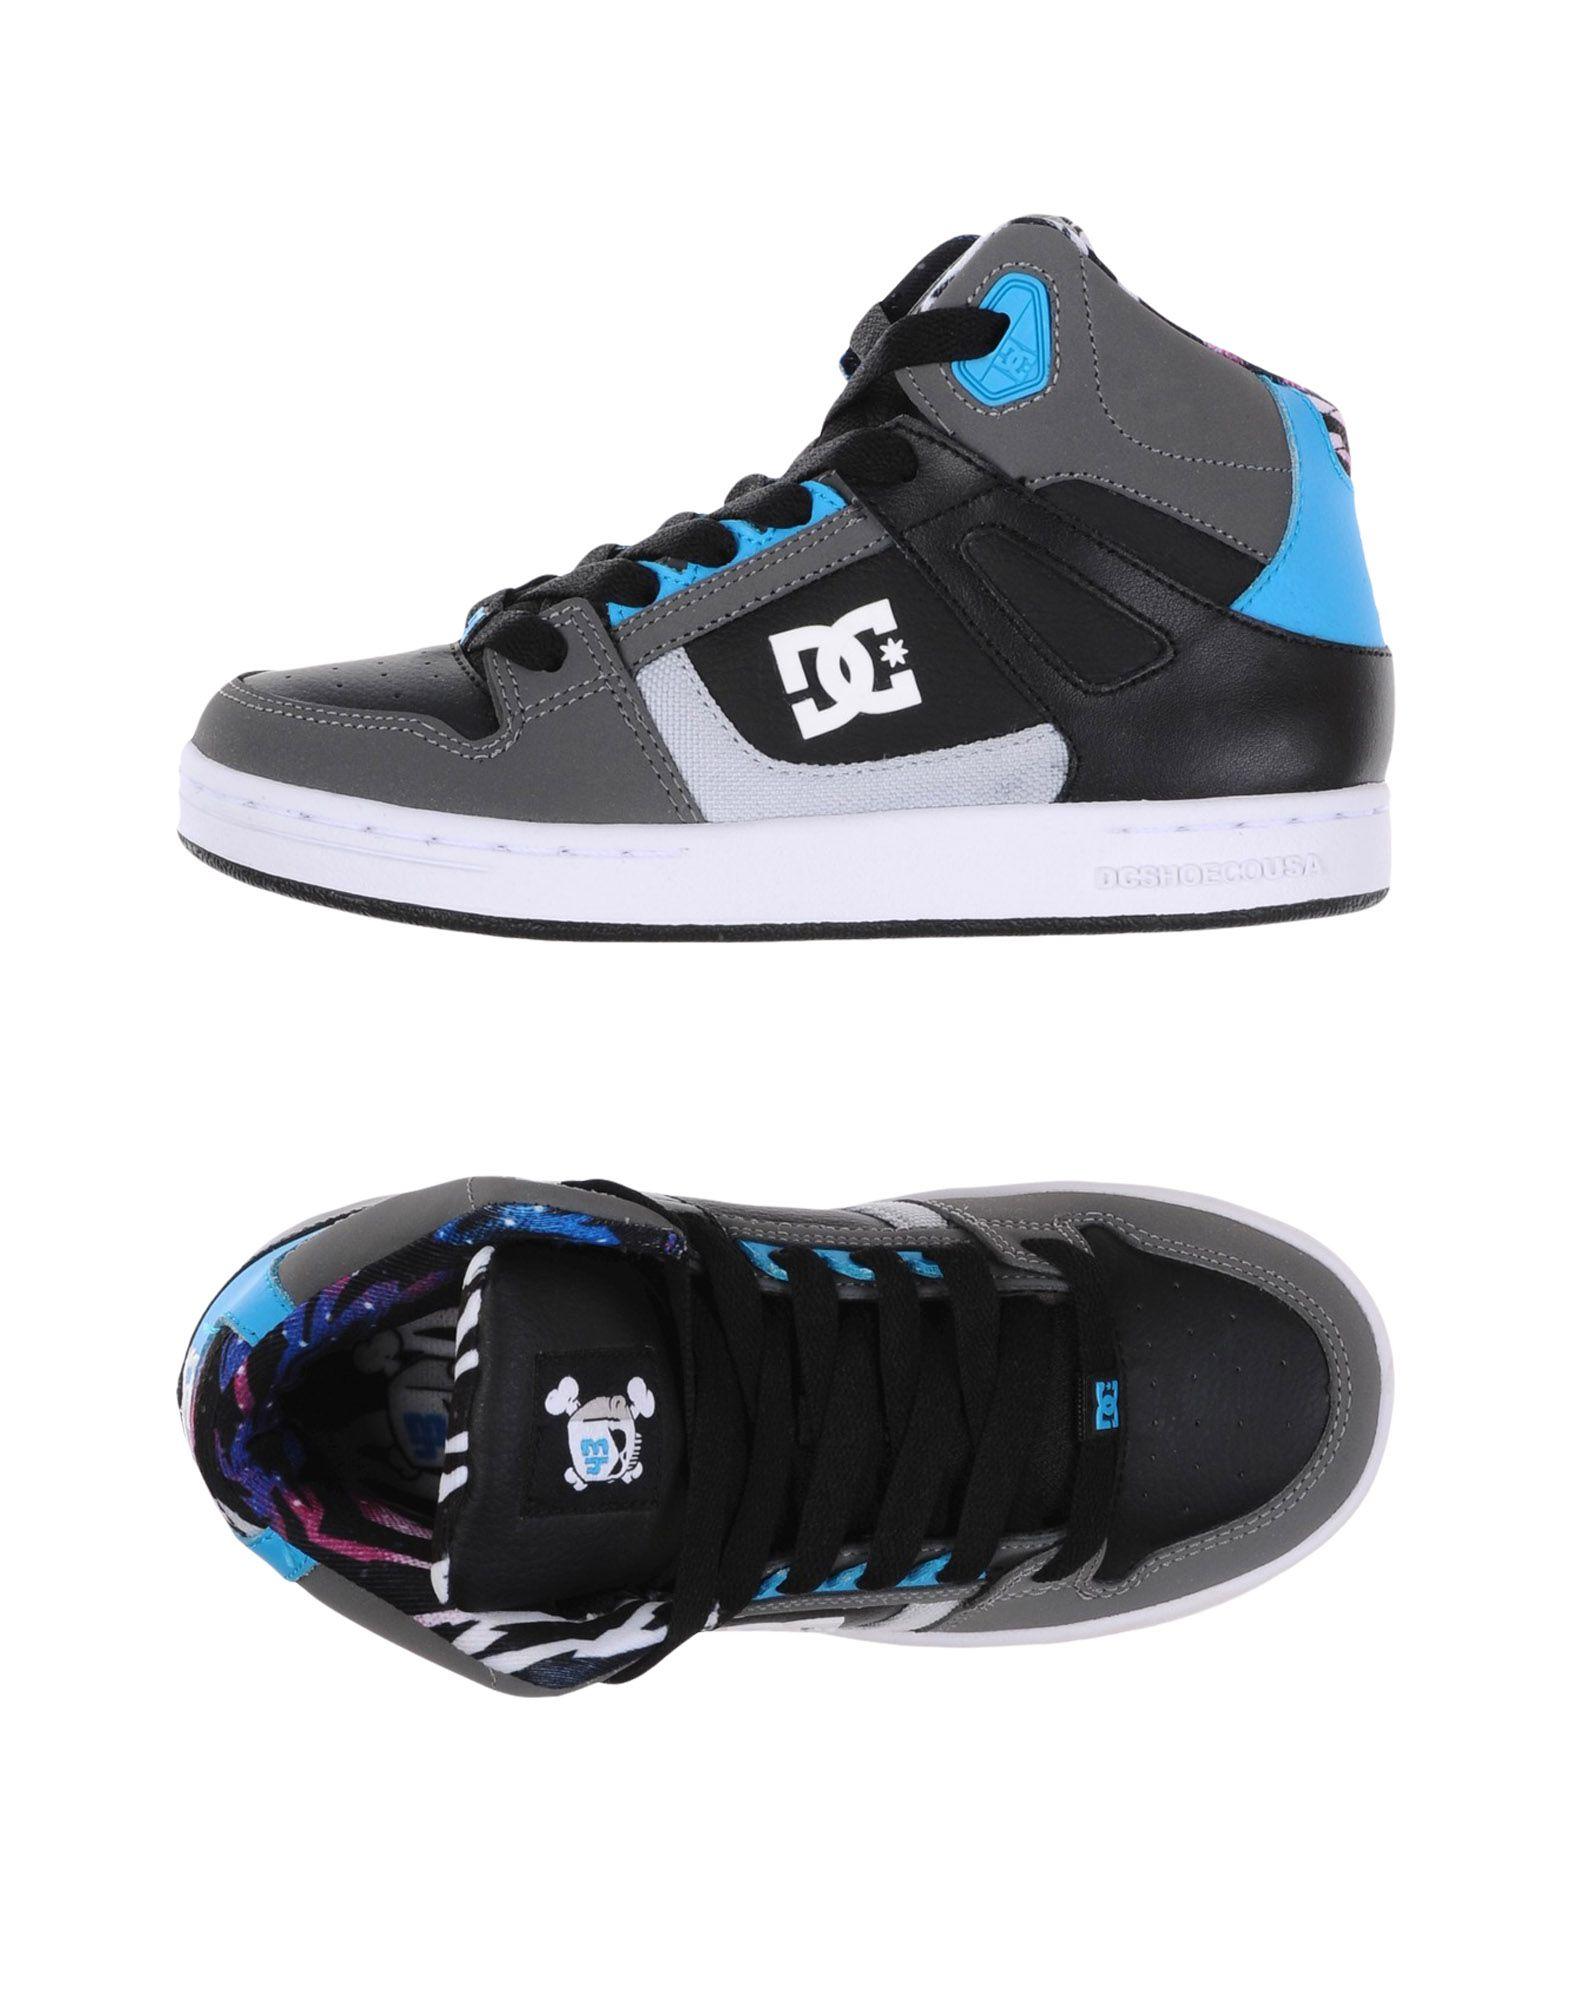 DC SHOECOUSA Высокие кеды и кроссовки кеды кроссовки высокие детские dc pure ht se ev black multi